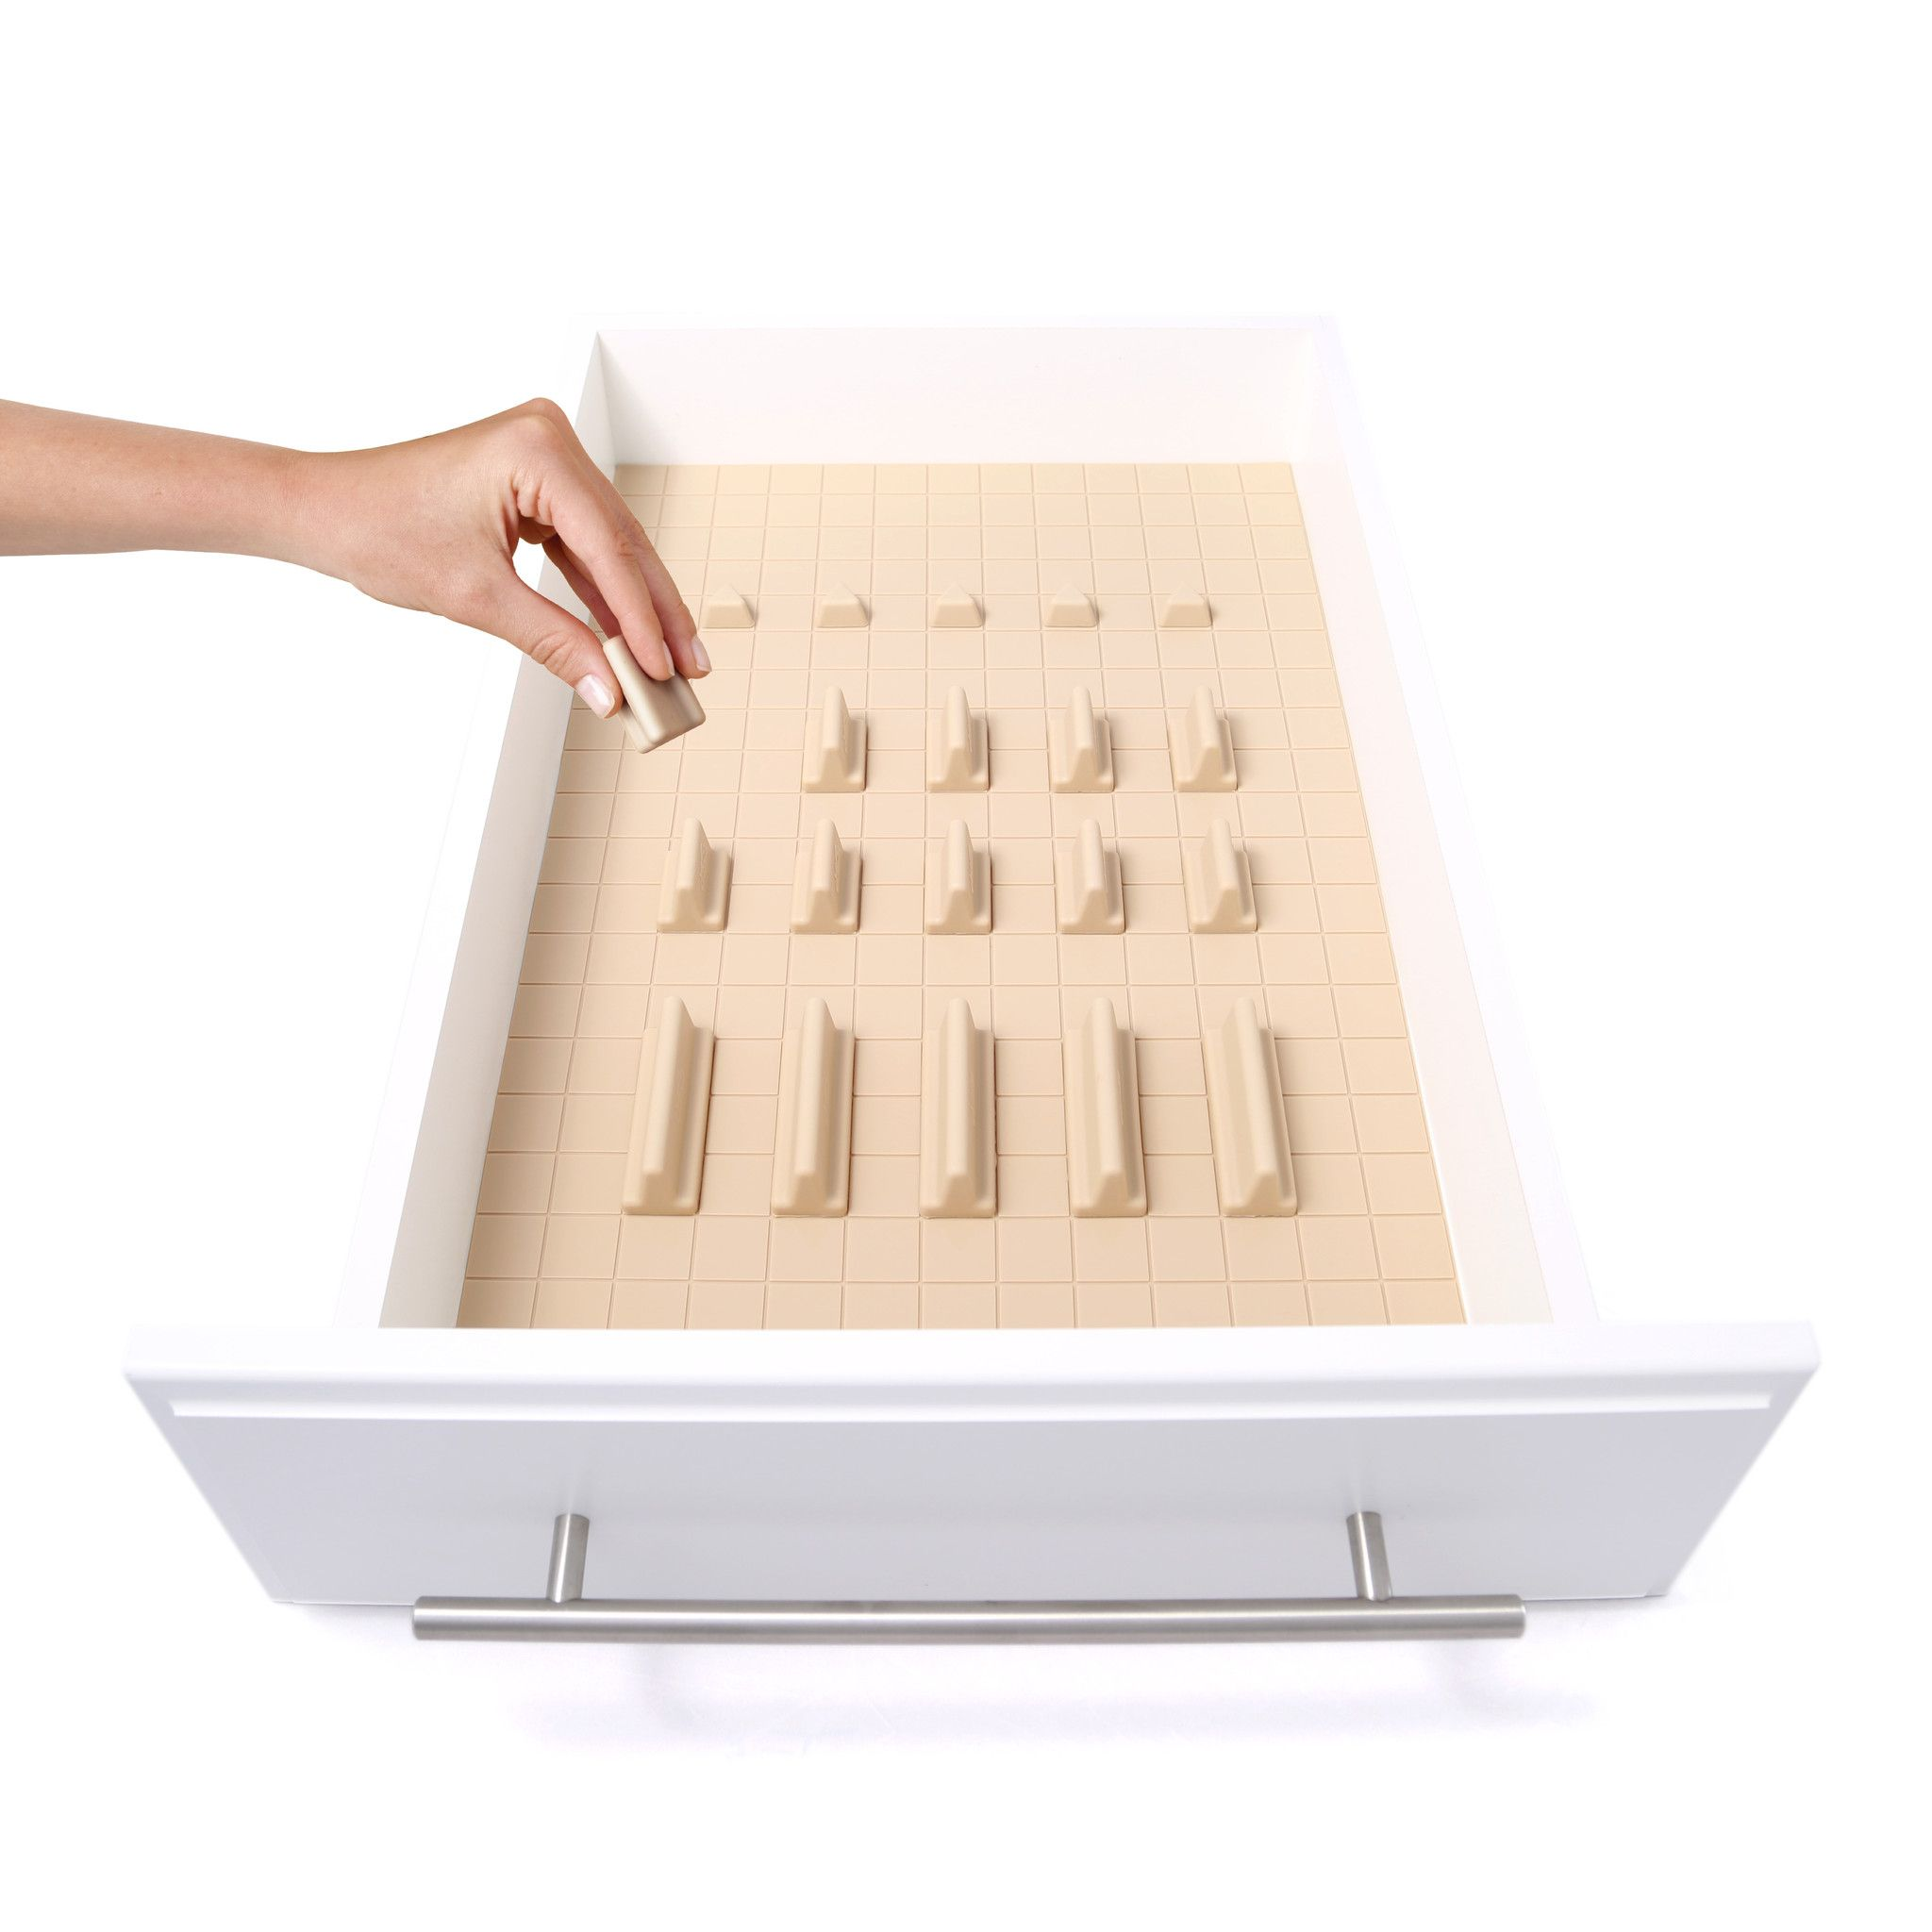 Drawerdecor Deluxe Starter Kit 21 Piece Set In 2020 Kitchen Drawer Organization Drawer Organisers Kitchen Drawers